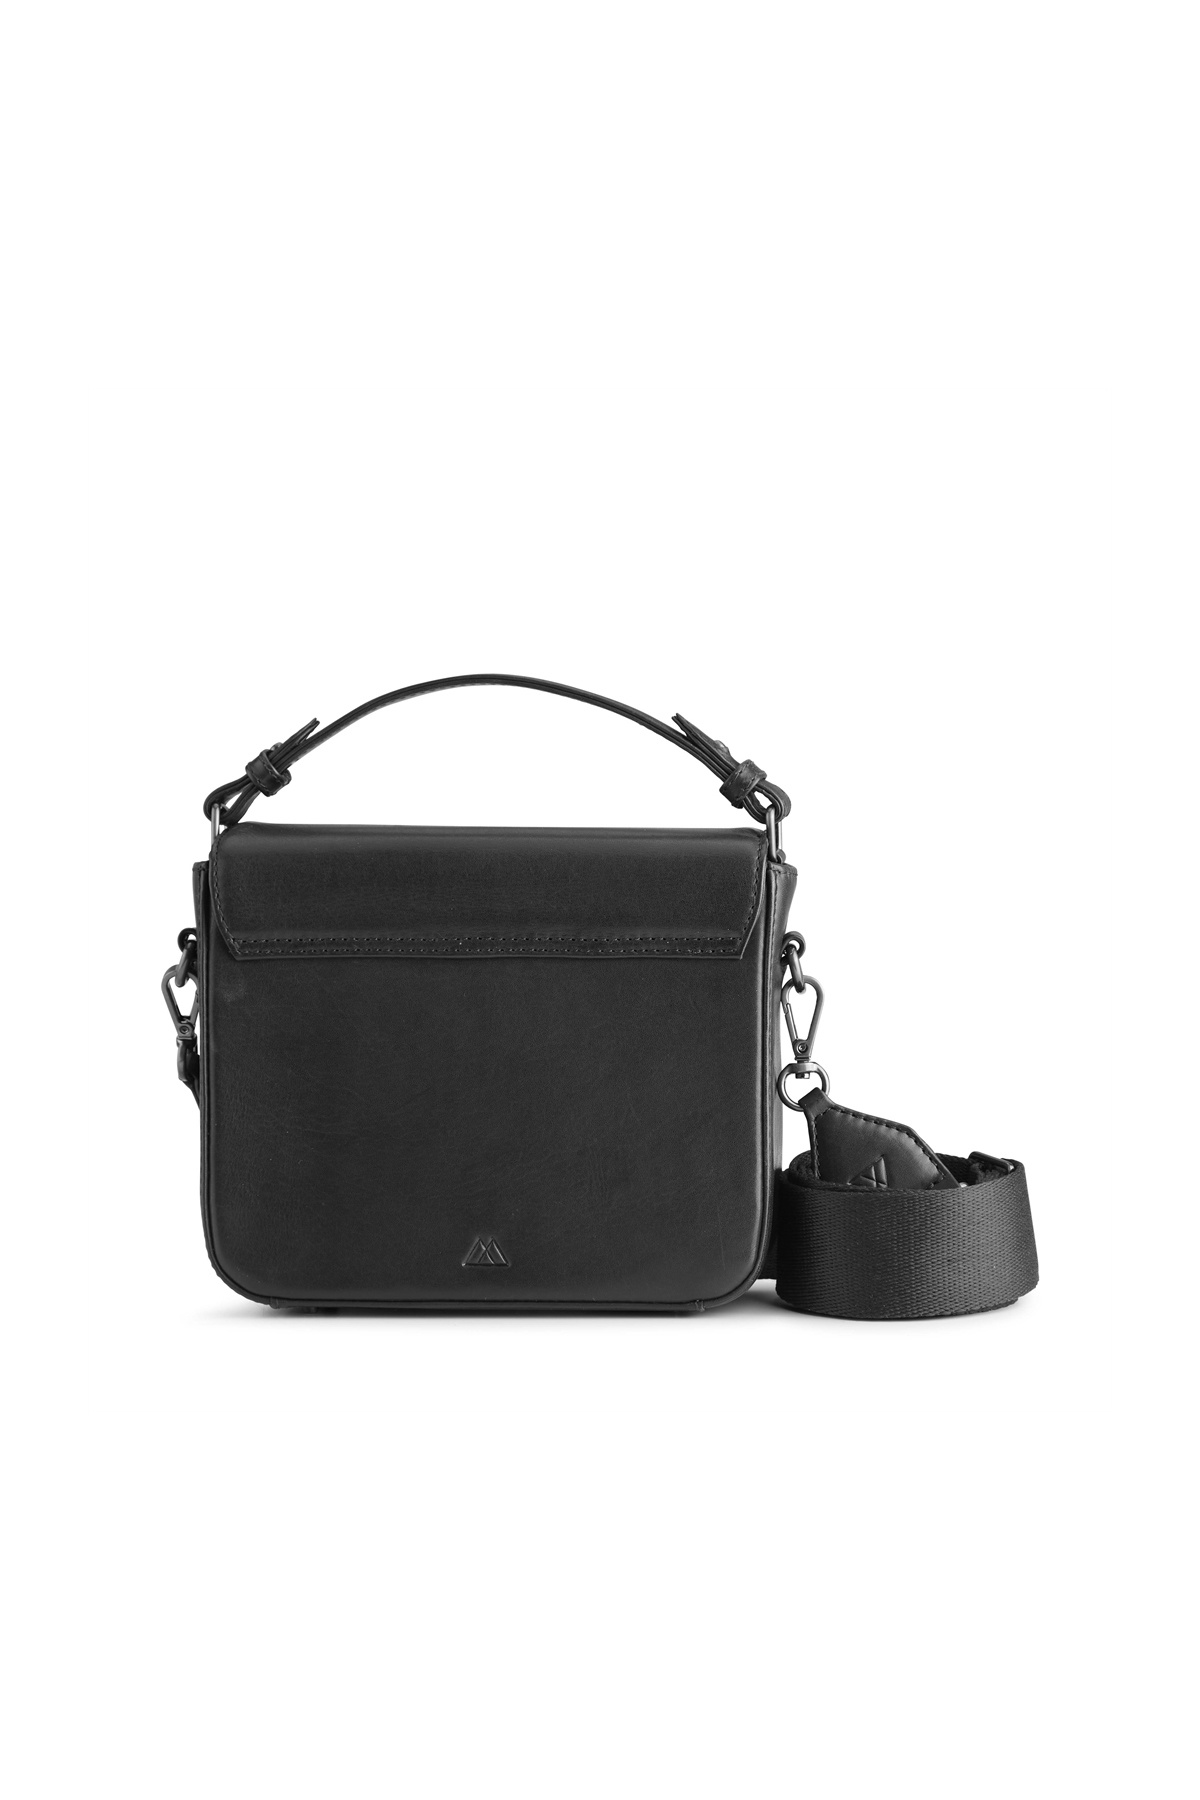 Adora Large Crossbody Bag - Antique Black w/ Black-7